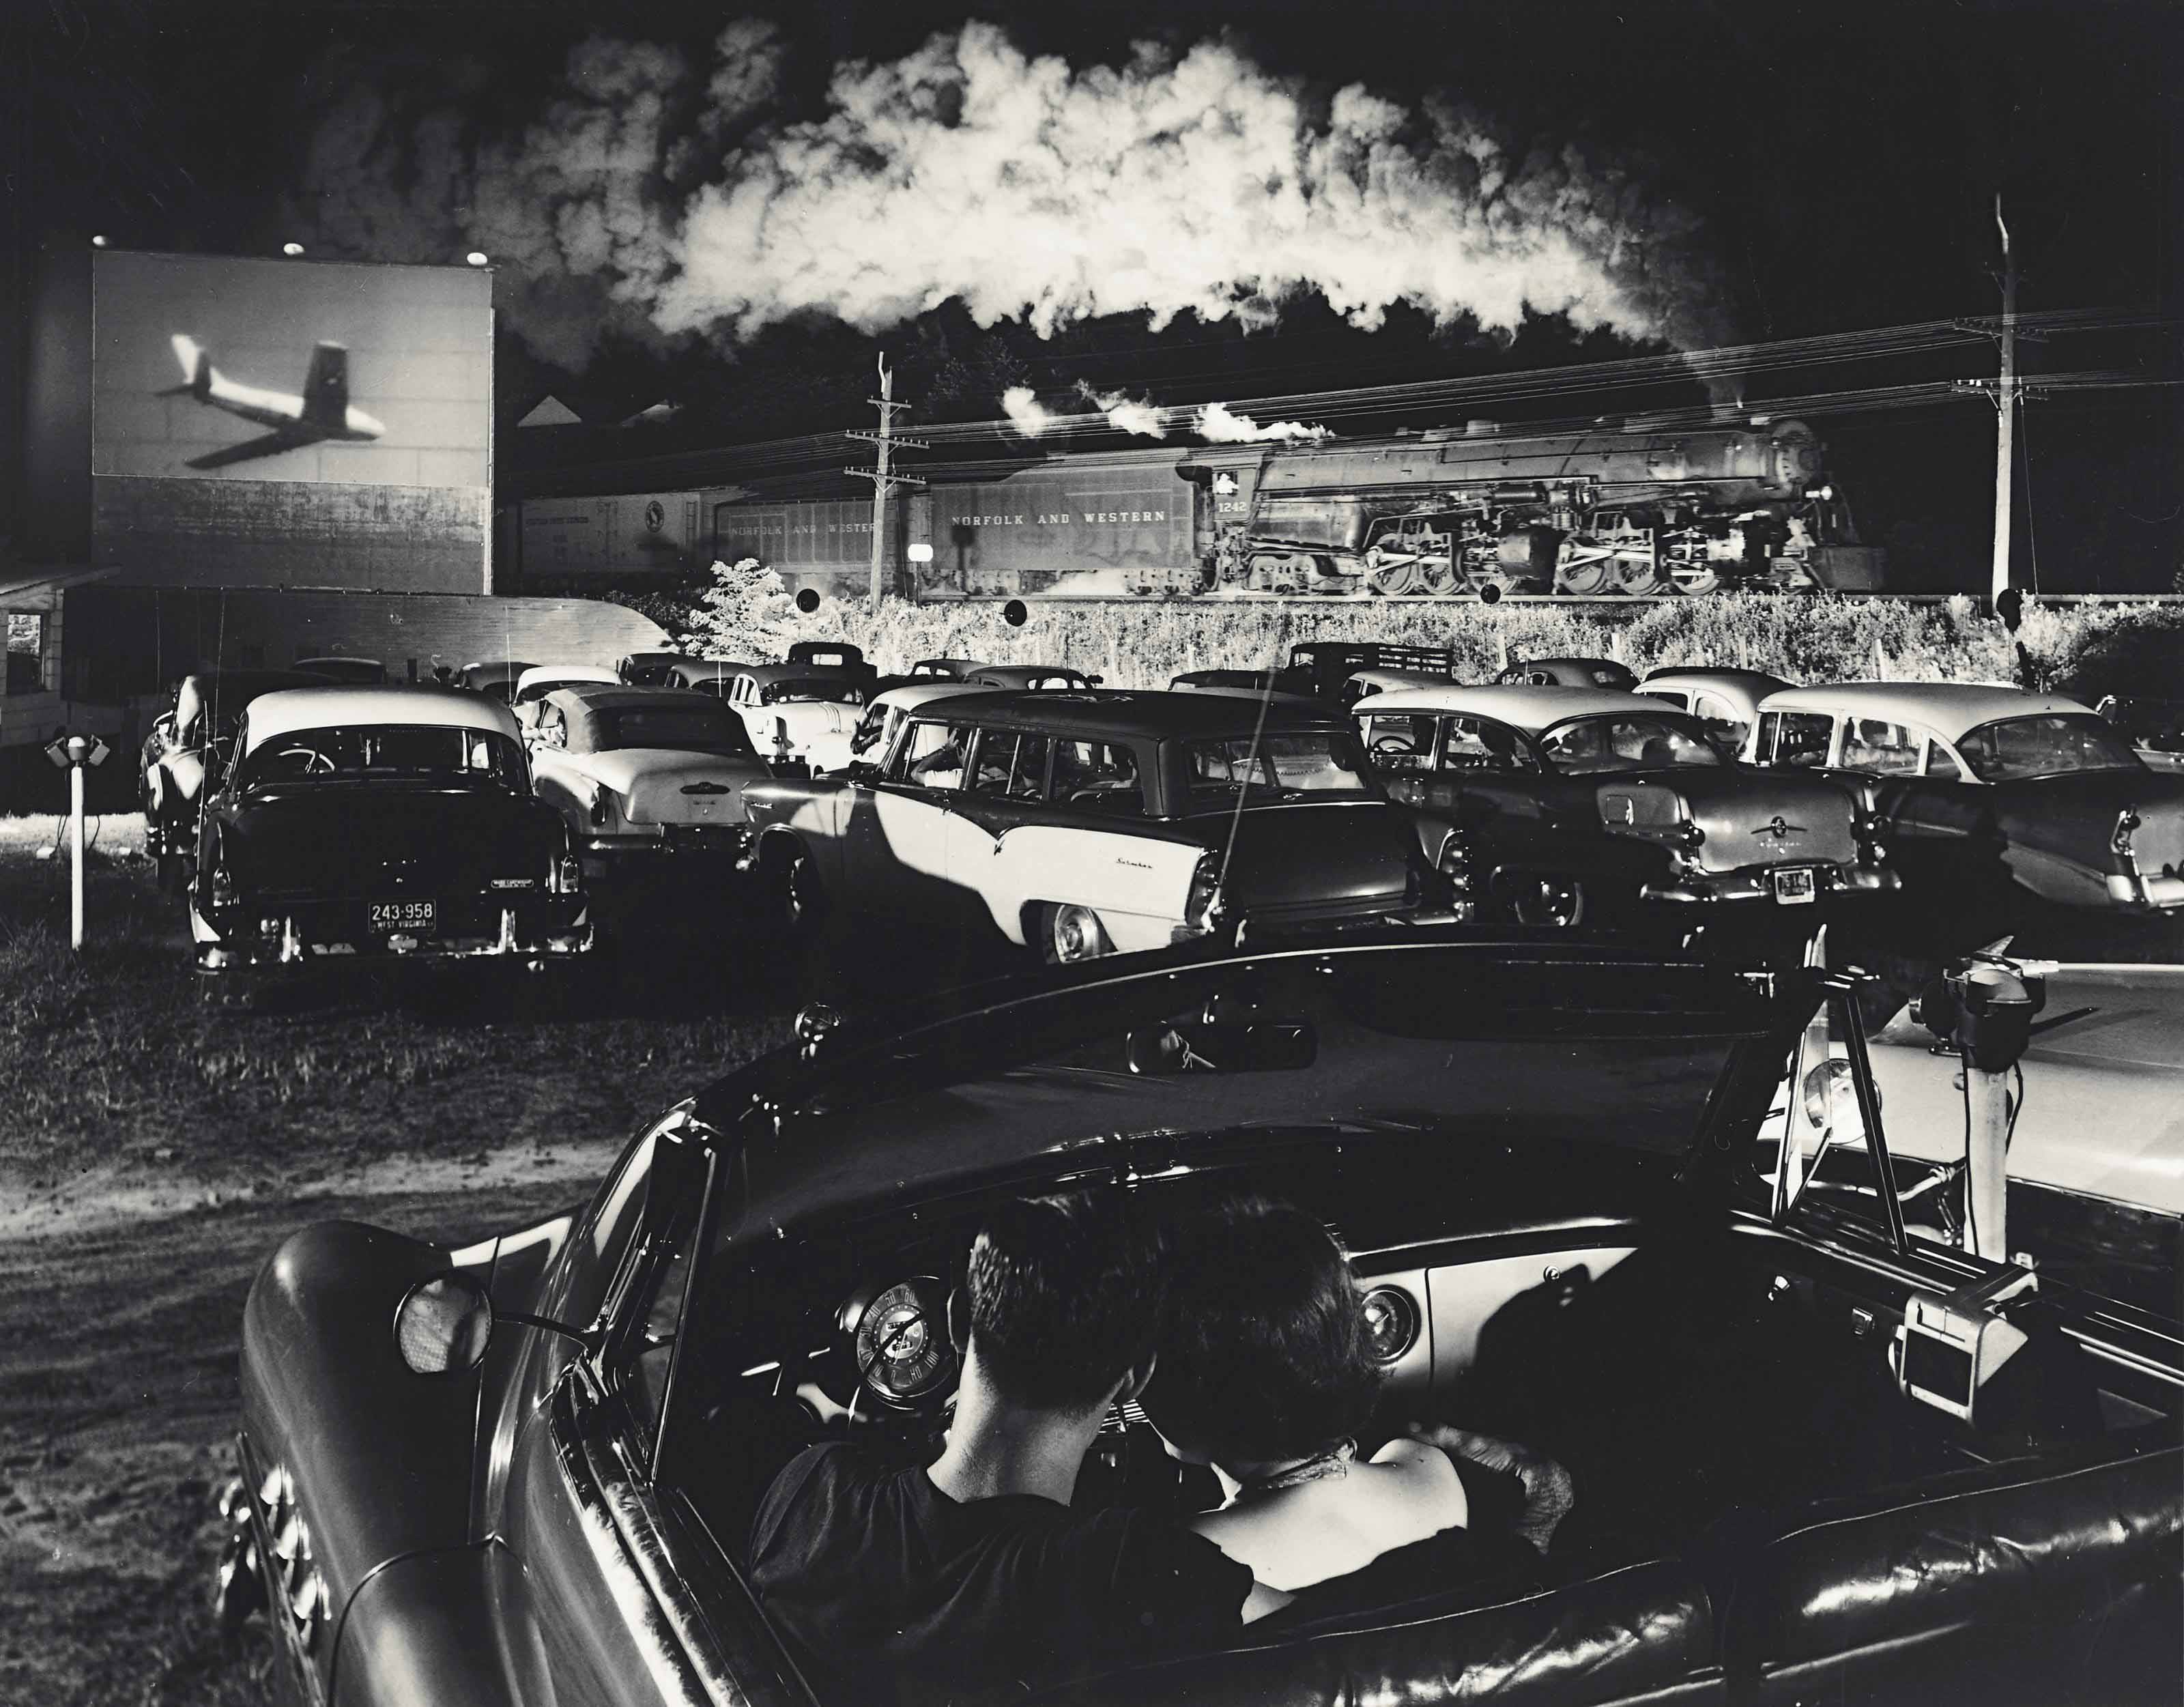 Hot Shot, East Bound, Iaeger, West Virginia, 1956